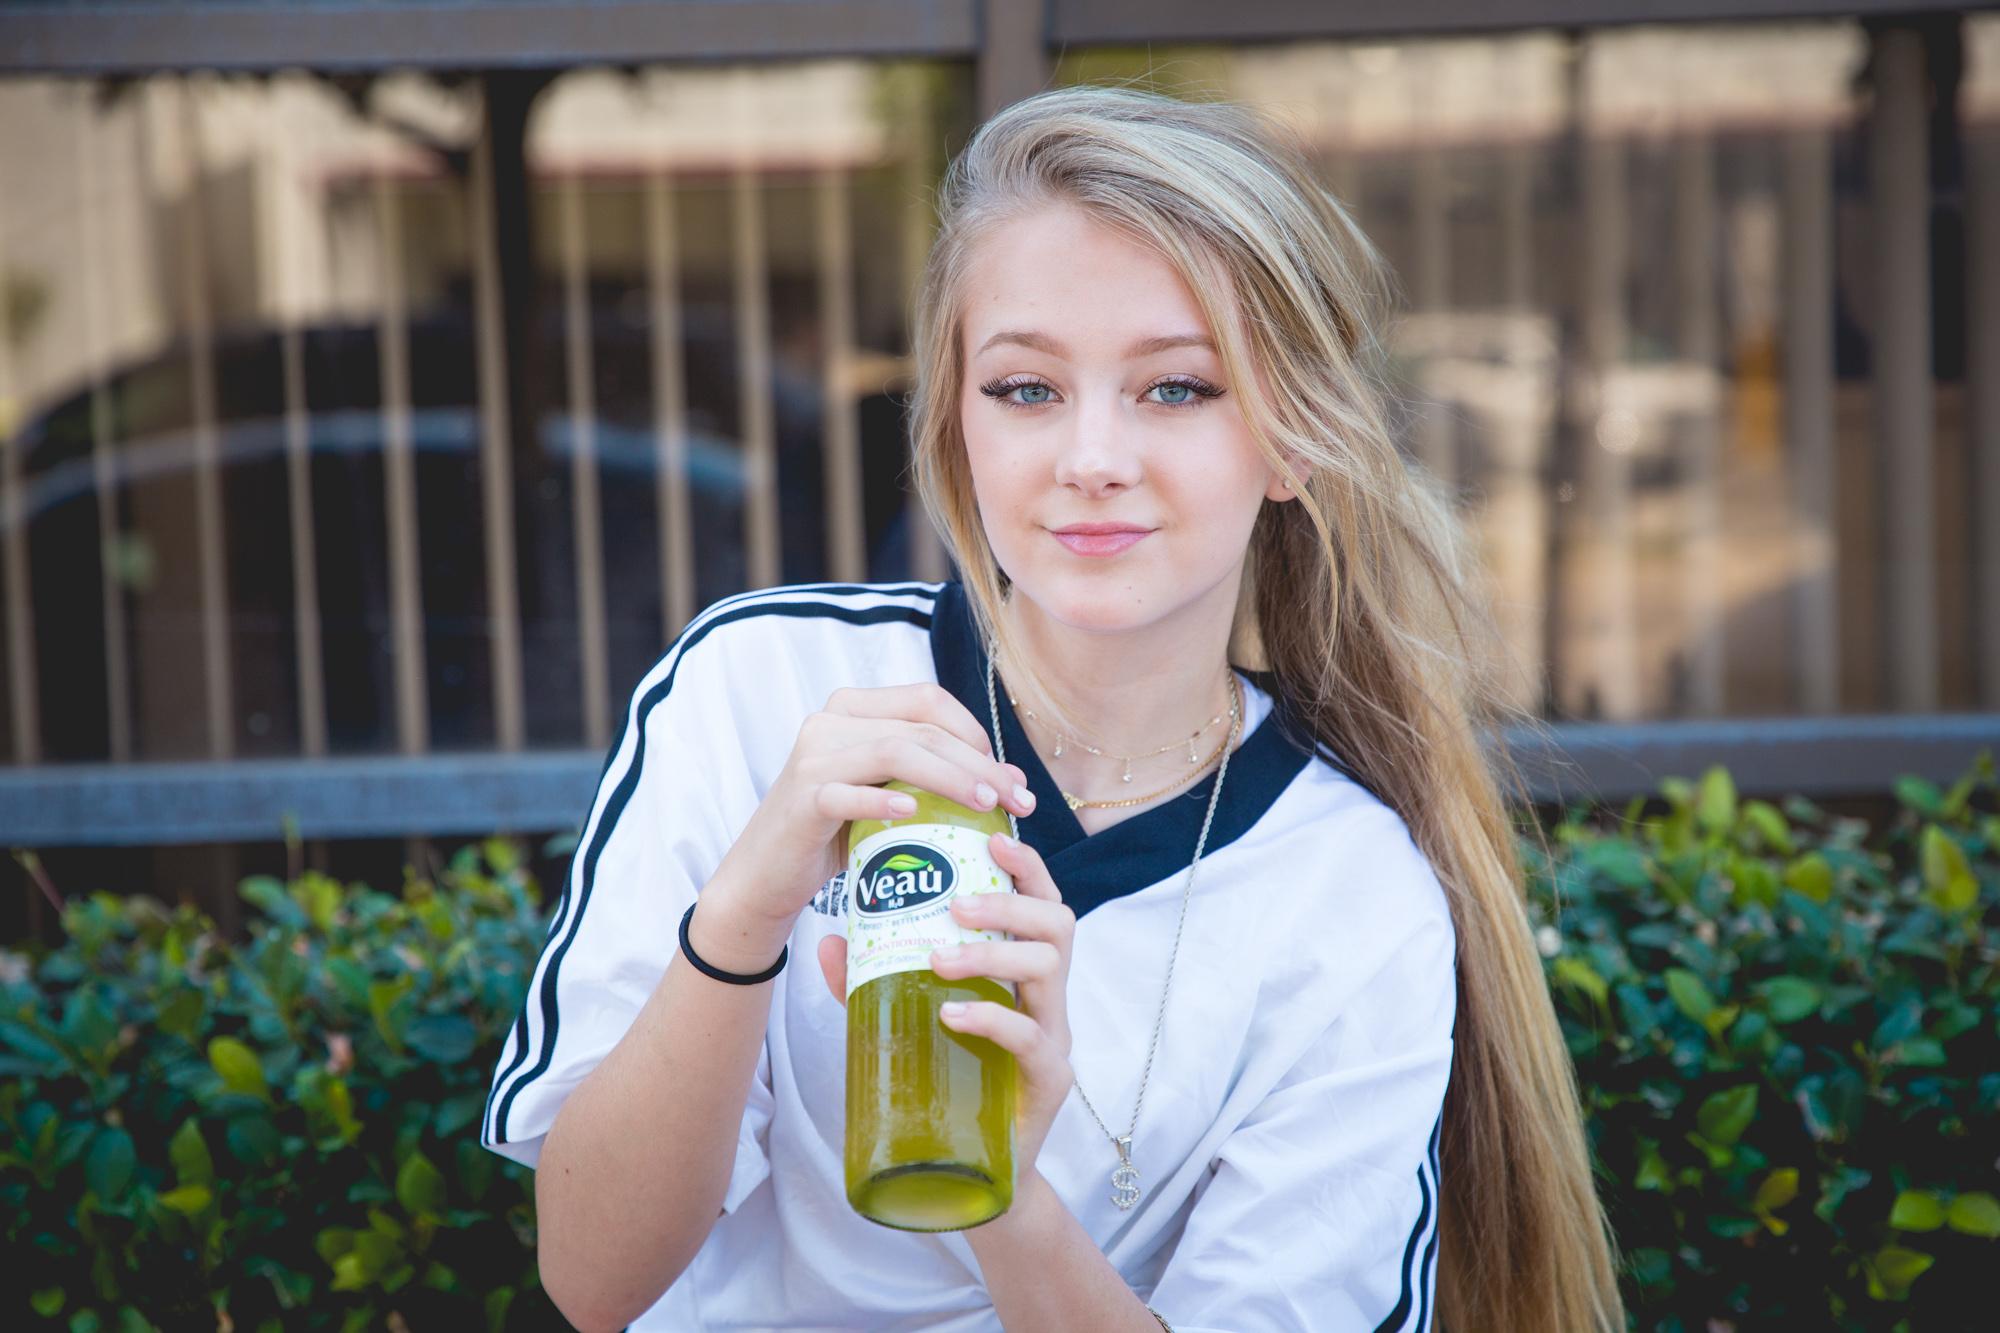 Lexi Drew - Enjoying Veau Water